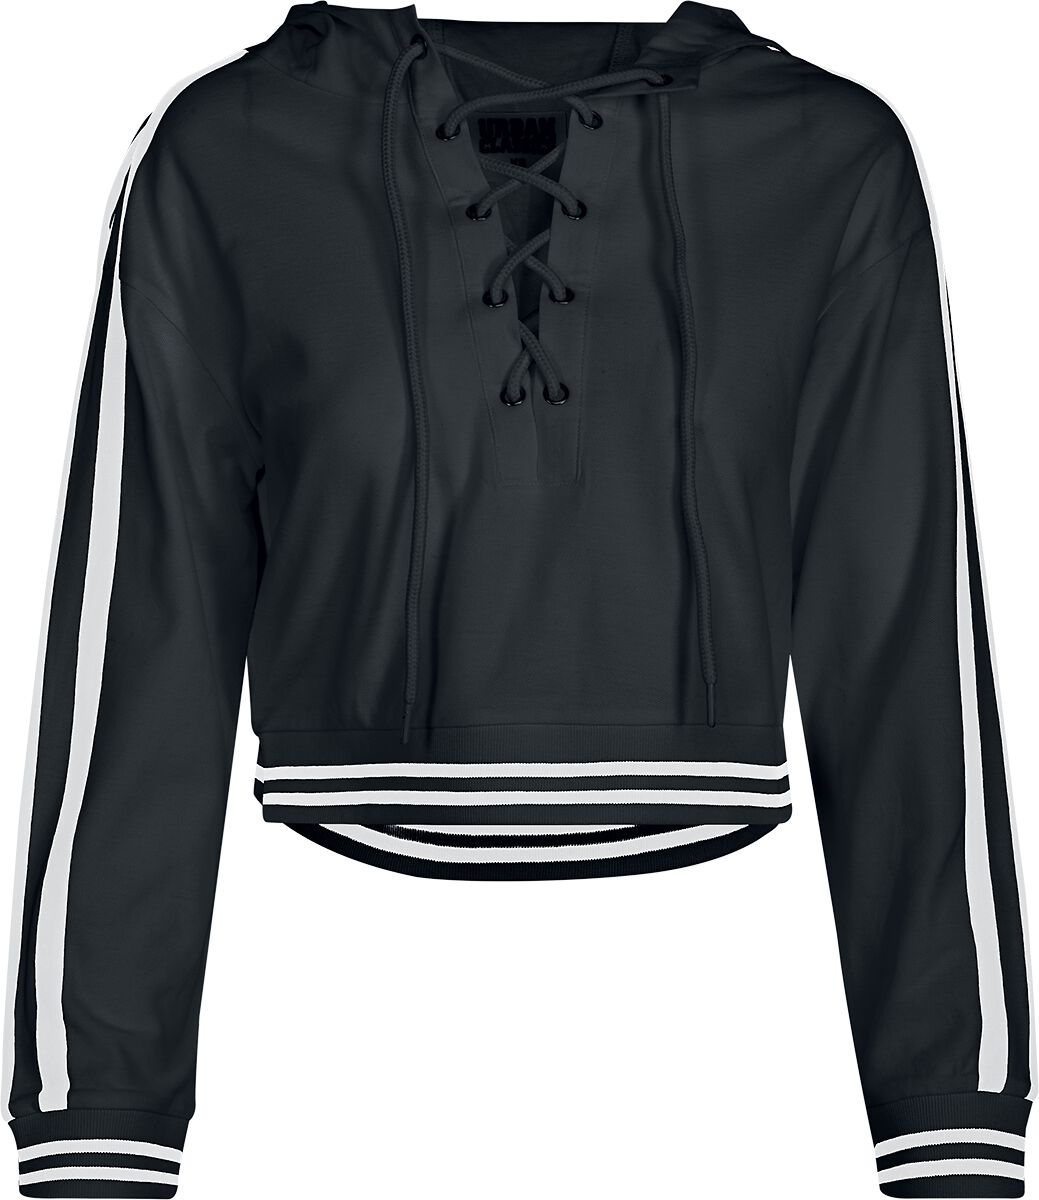 Urban Classics Ladies Short Lace Up Hoody Bluza damska czarny/biały